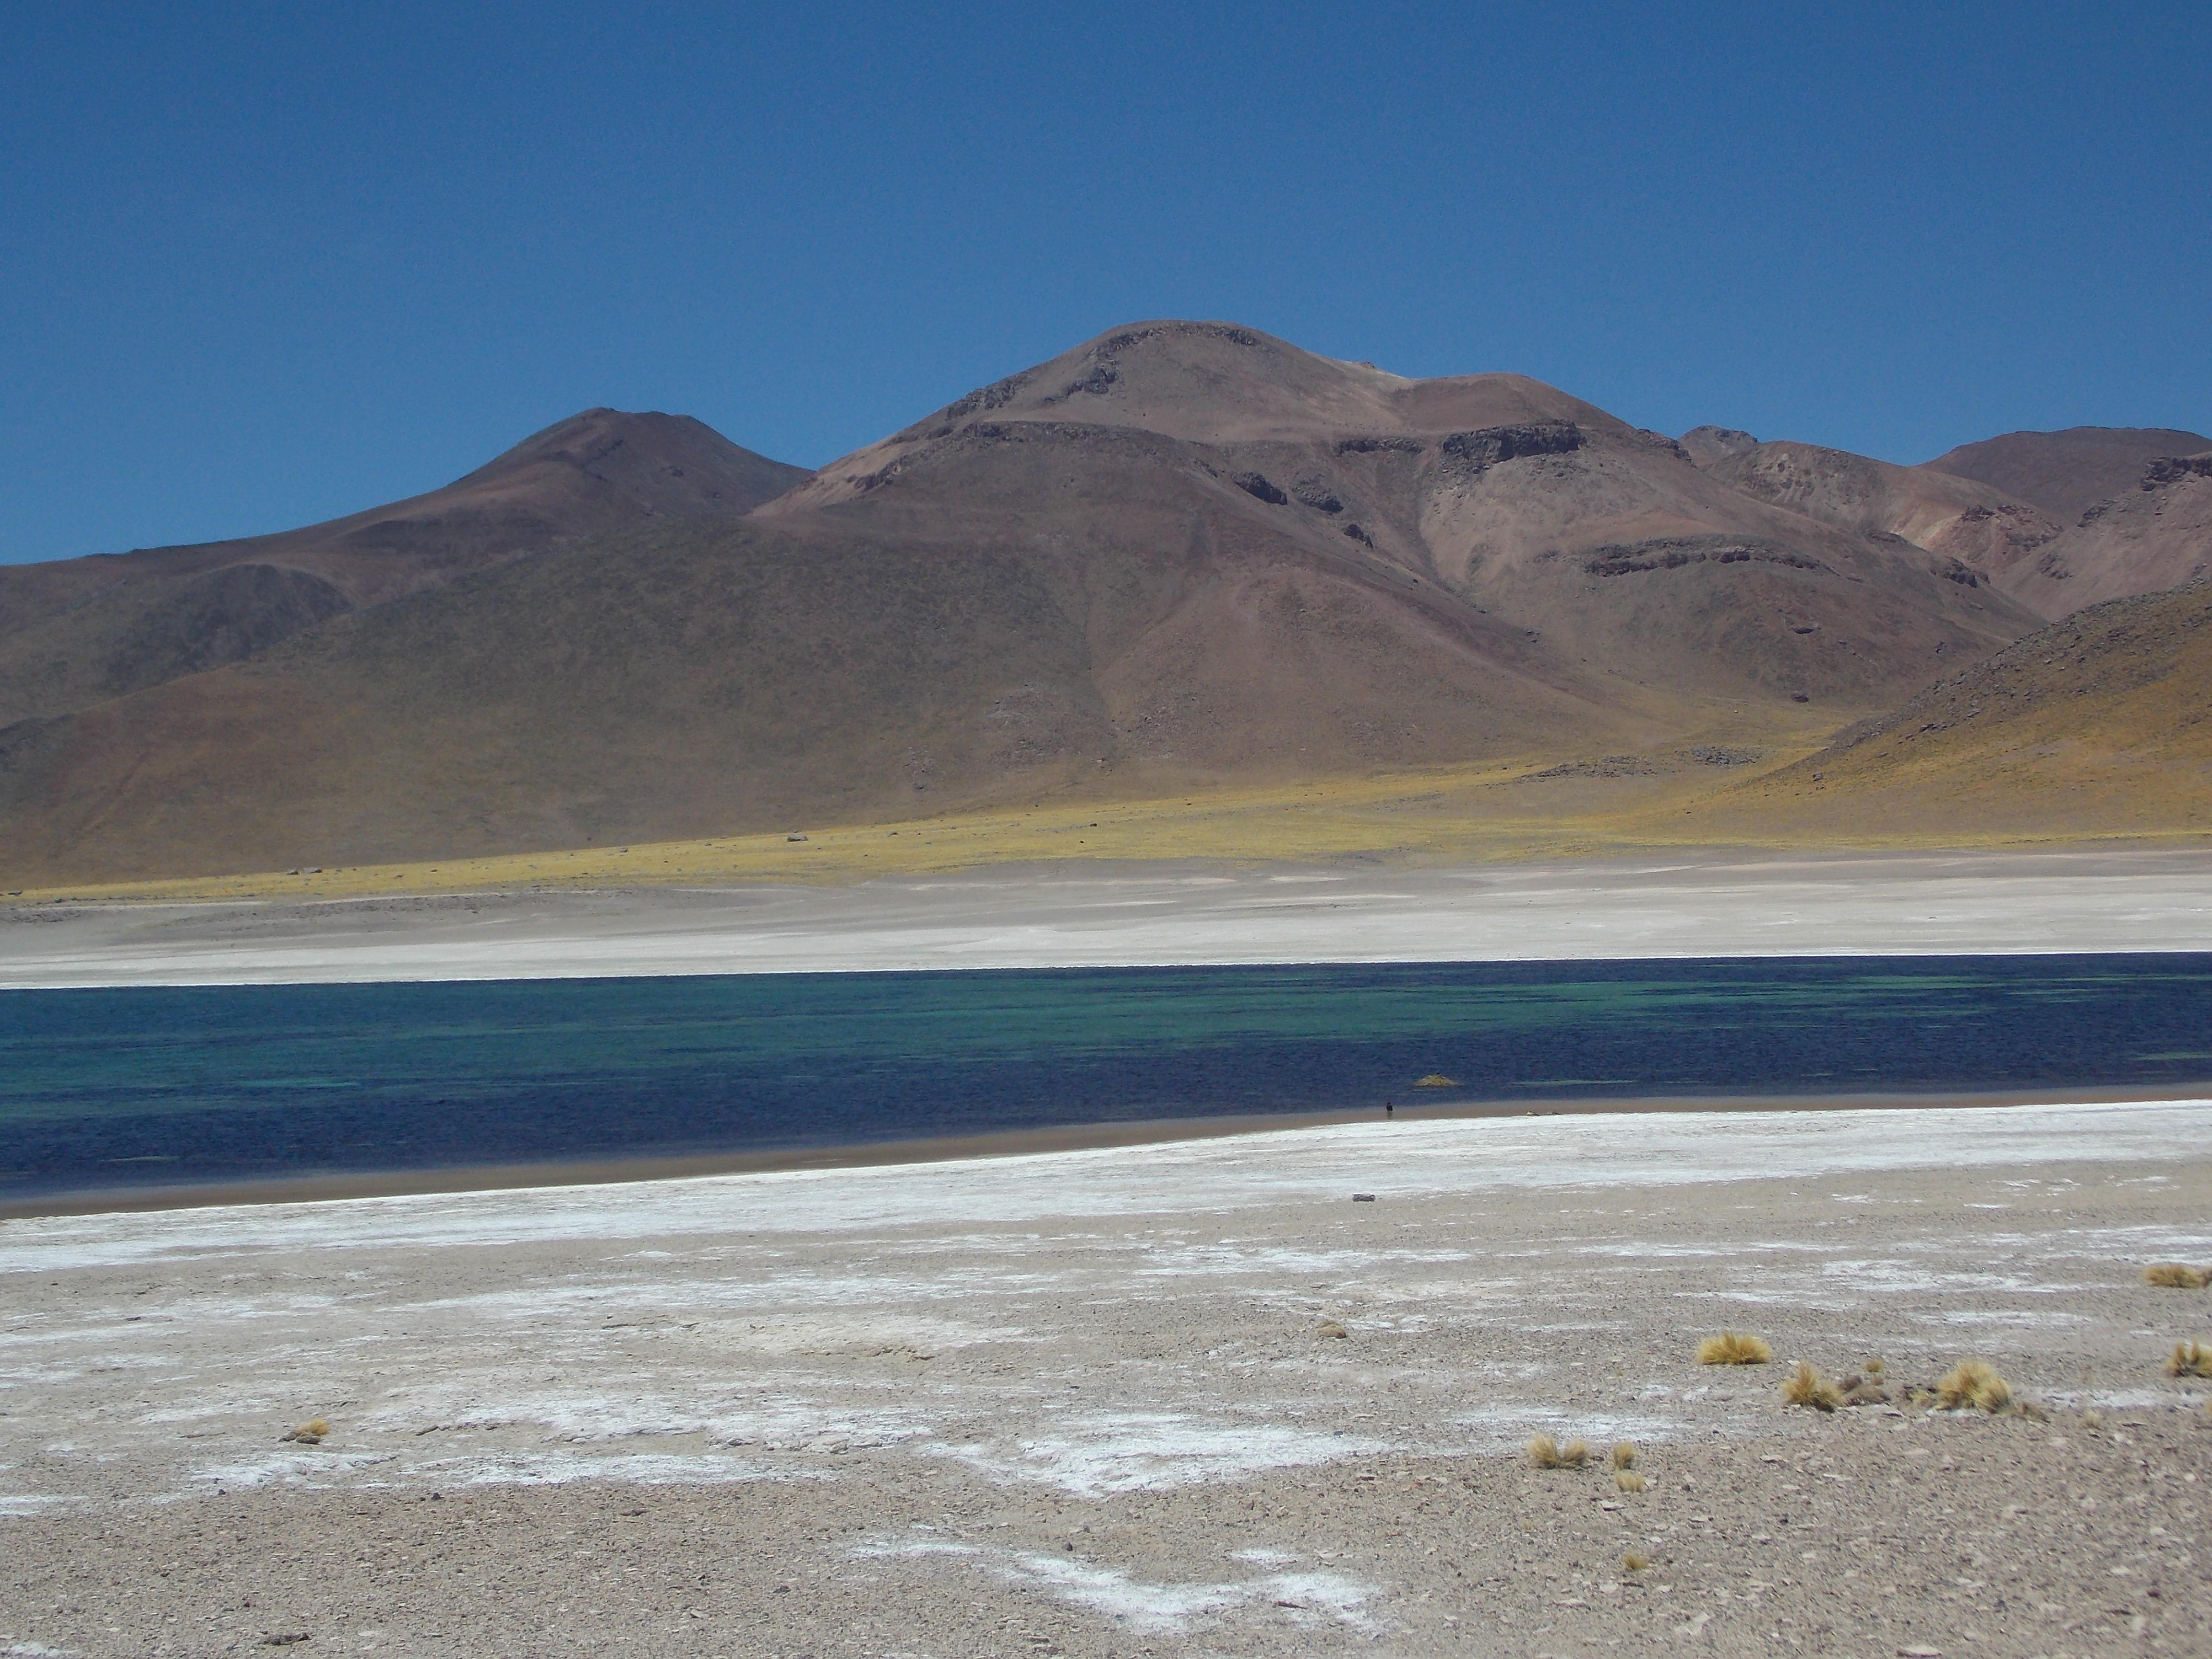 Un posto bello che ho visto: San Pedro de Atacama